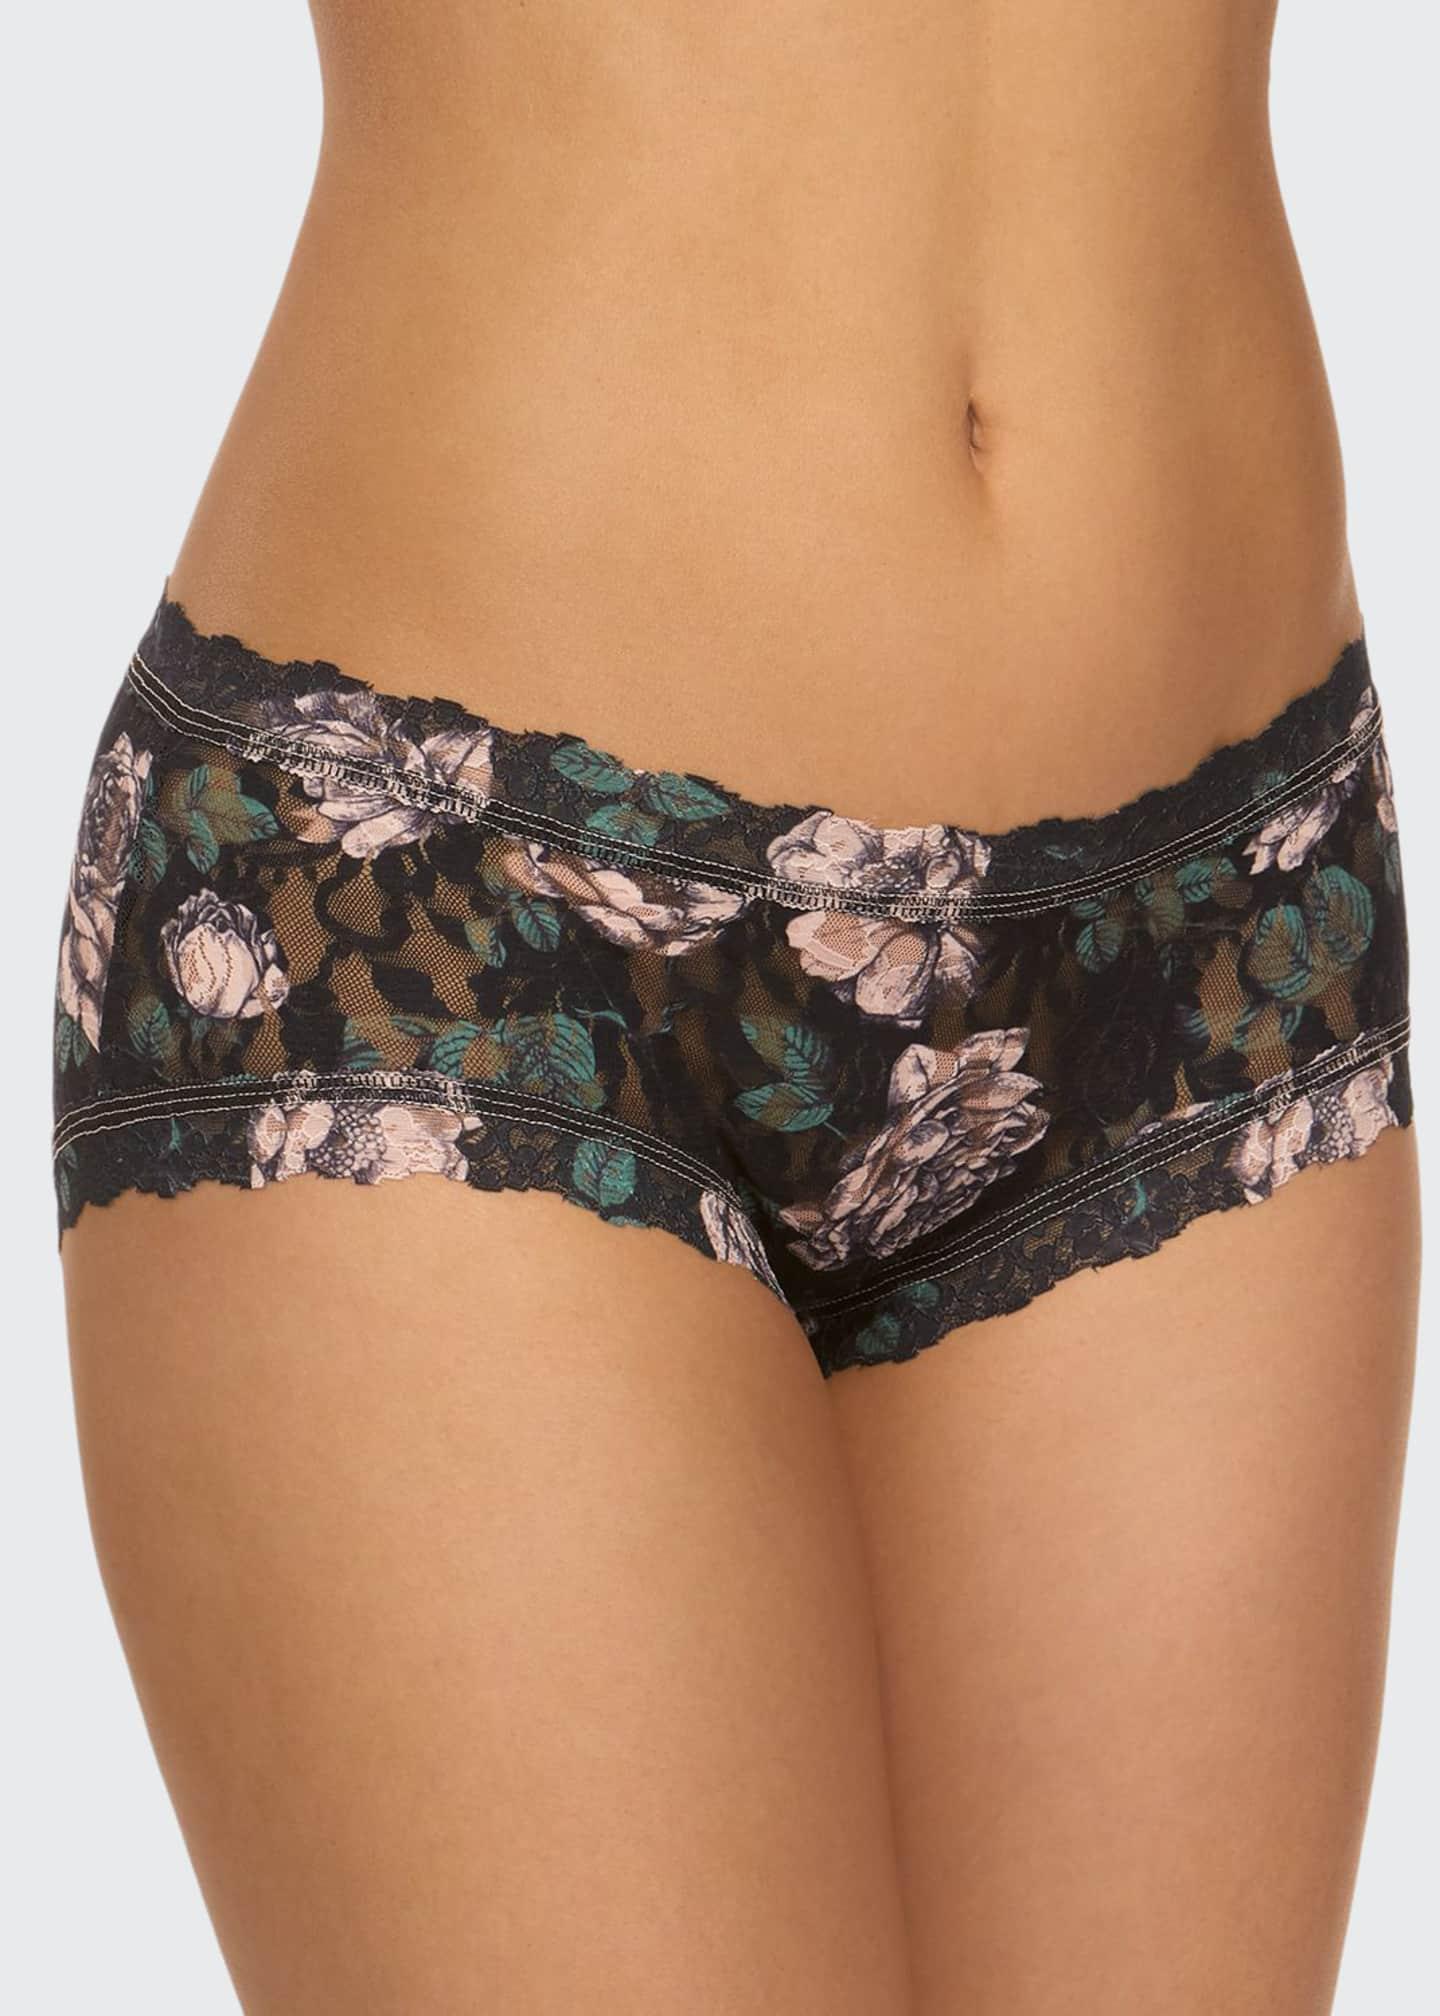 Hanky Panky Floral-Print Lace Girlkini Boyshorts